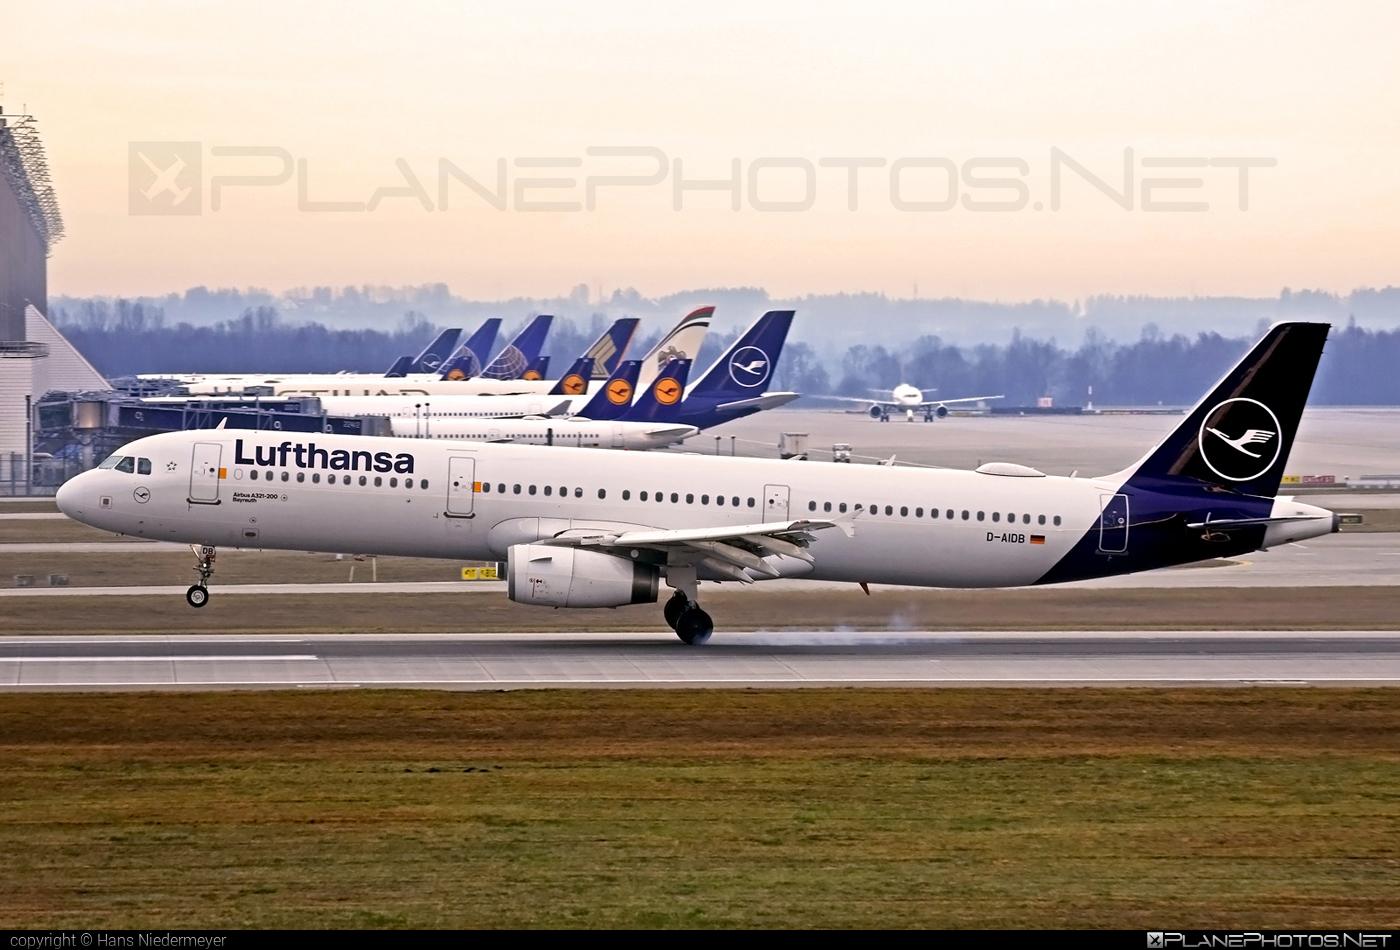 Airbus A321-231 - D-AIDB operated by Lufthansa #a320family #a321 #airbus #airbus321 #lufthansa